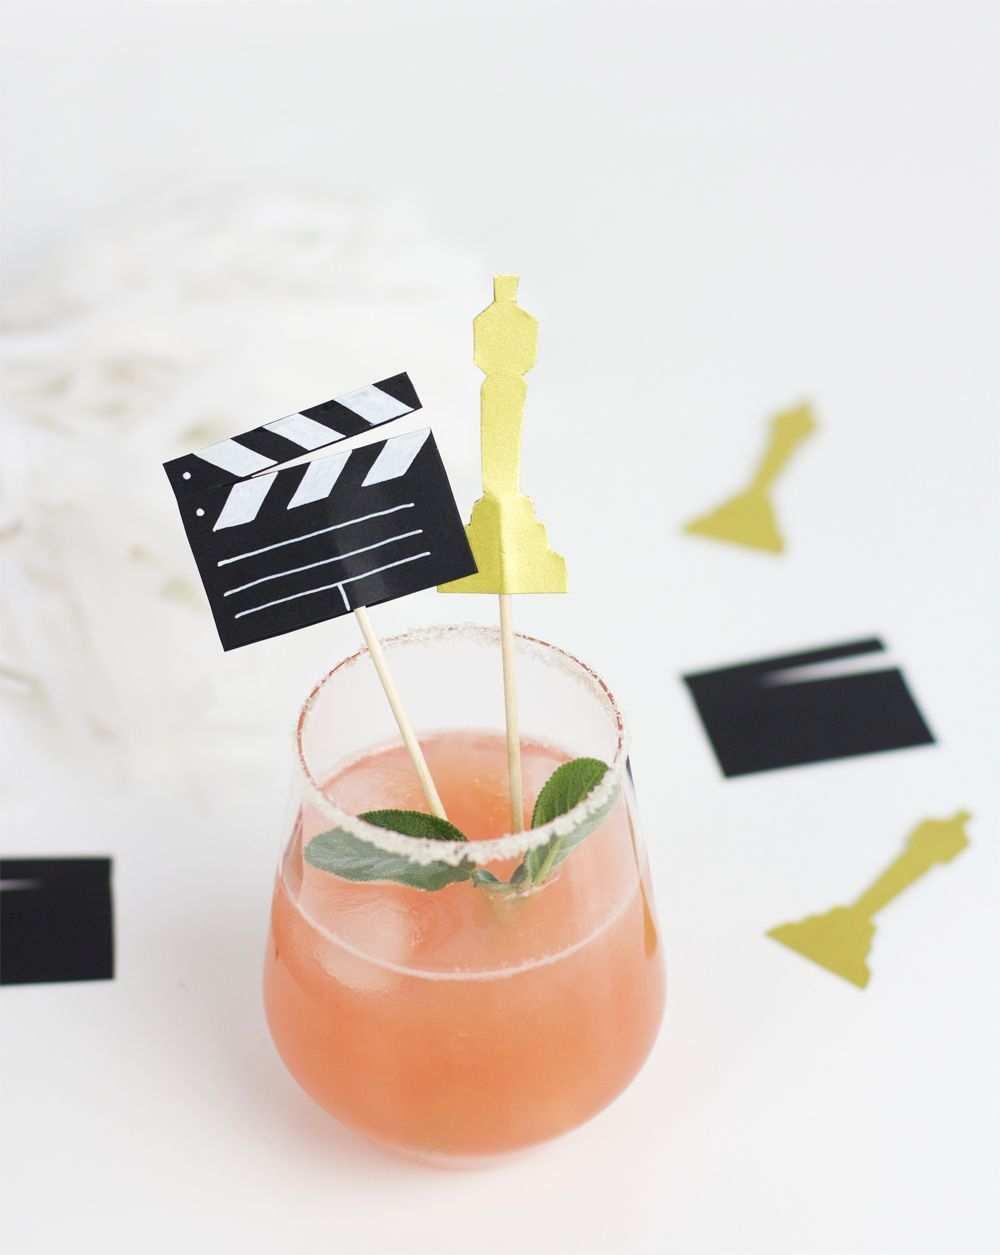 Diy Cocktailstabchen Fur Die Oscars We Love Handmade Oscar Party Anleitungen Diy Anleitungen